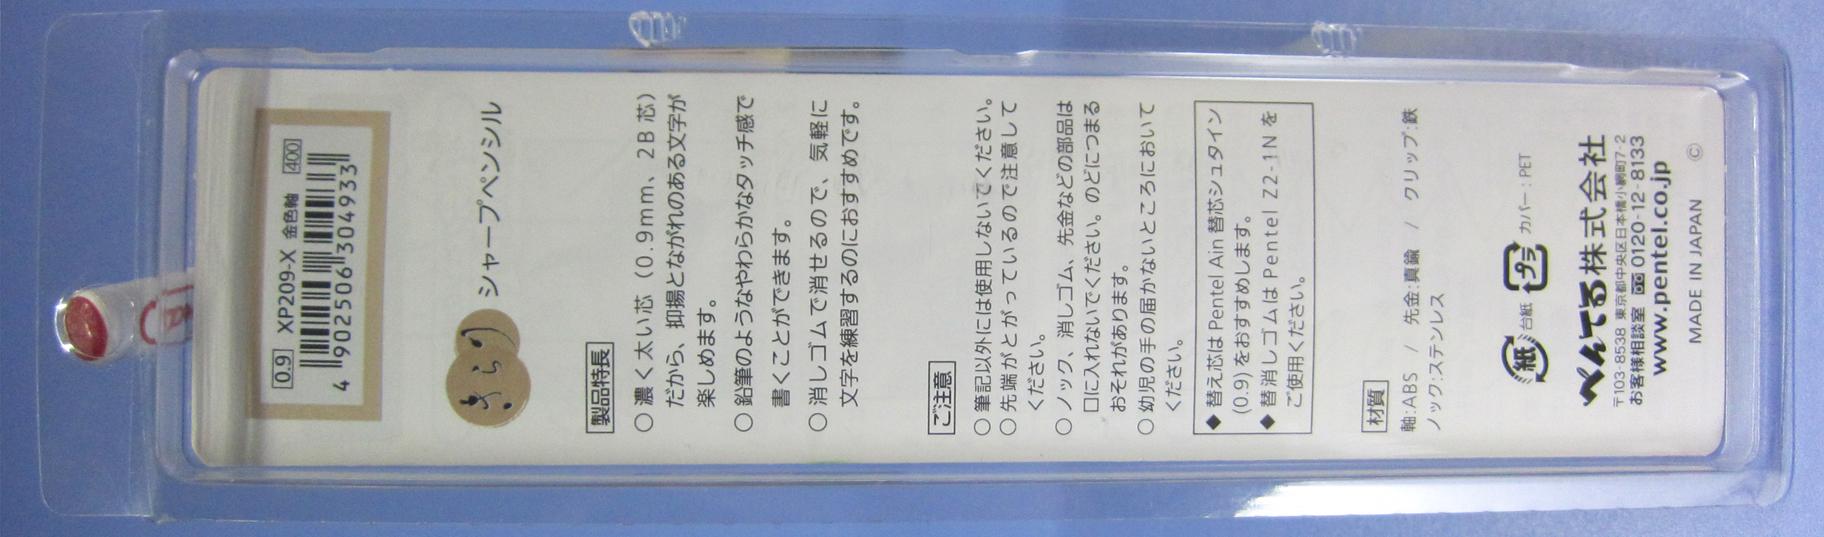 XP209-X Rear